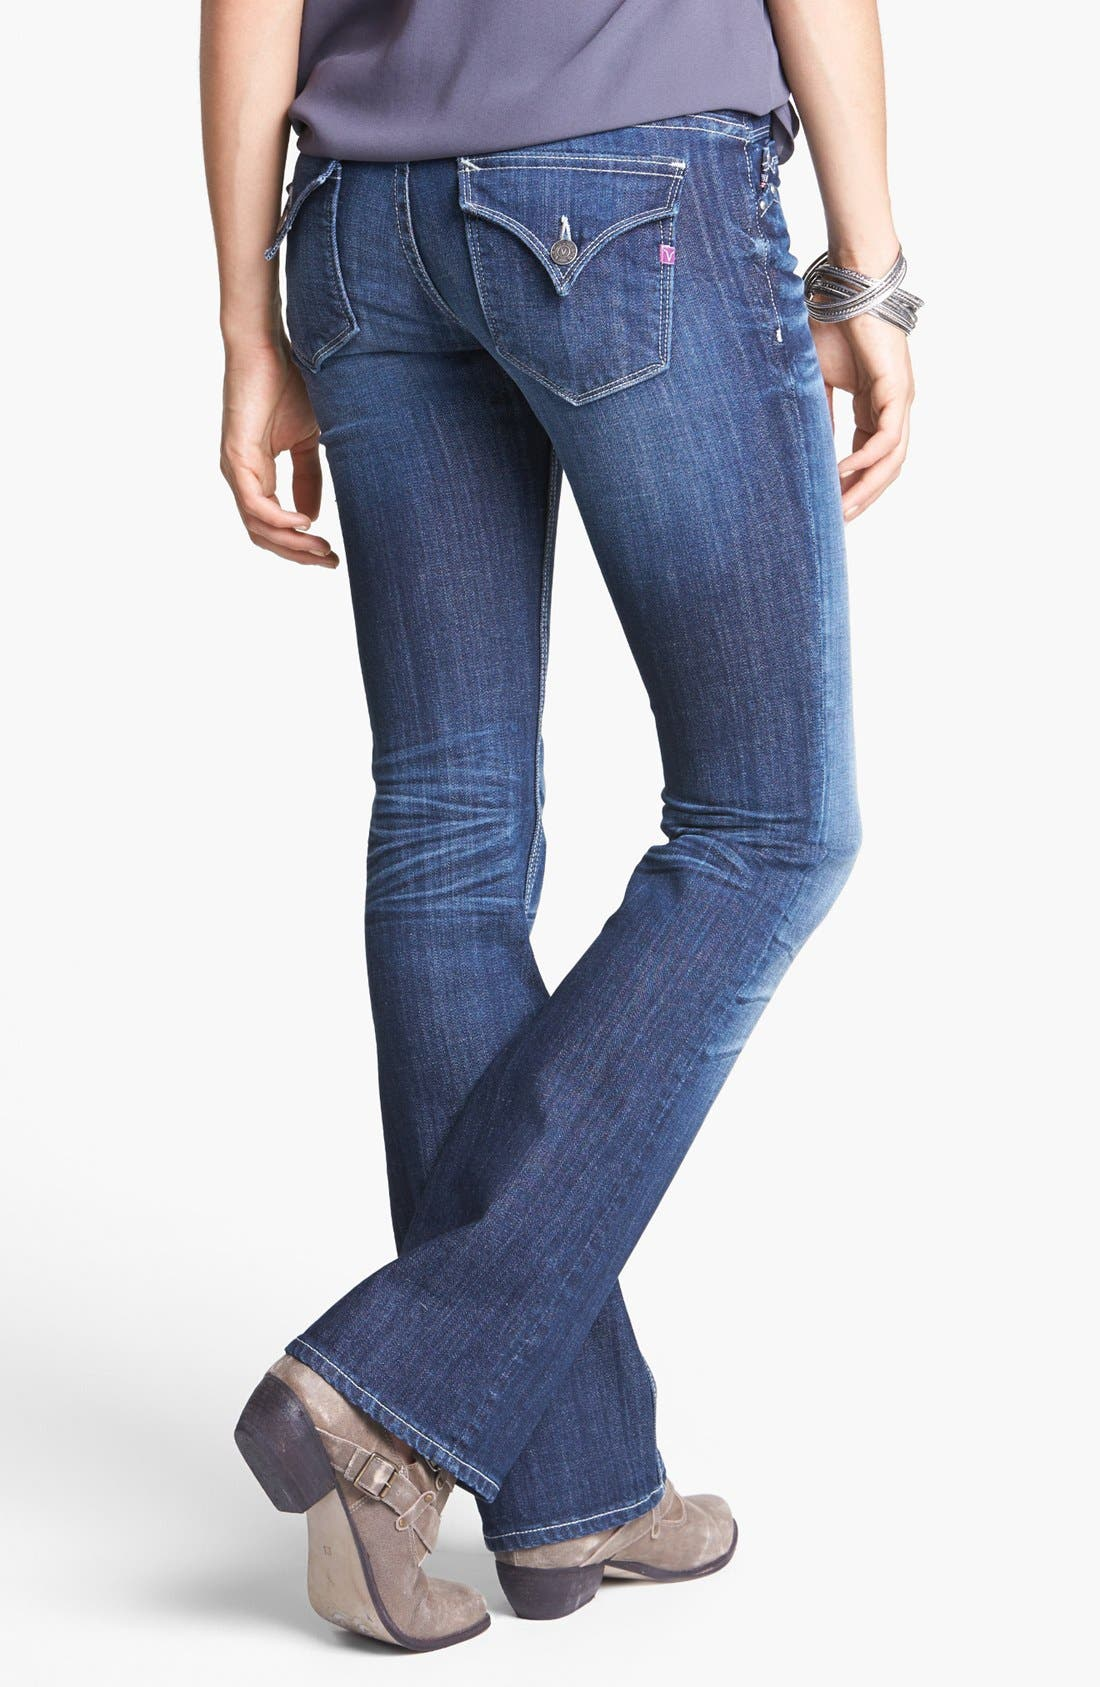 Alternate Image 1 Selected - Vigoss Flap Pocket Bootcut Jeans (Dark) (Juniors)